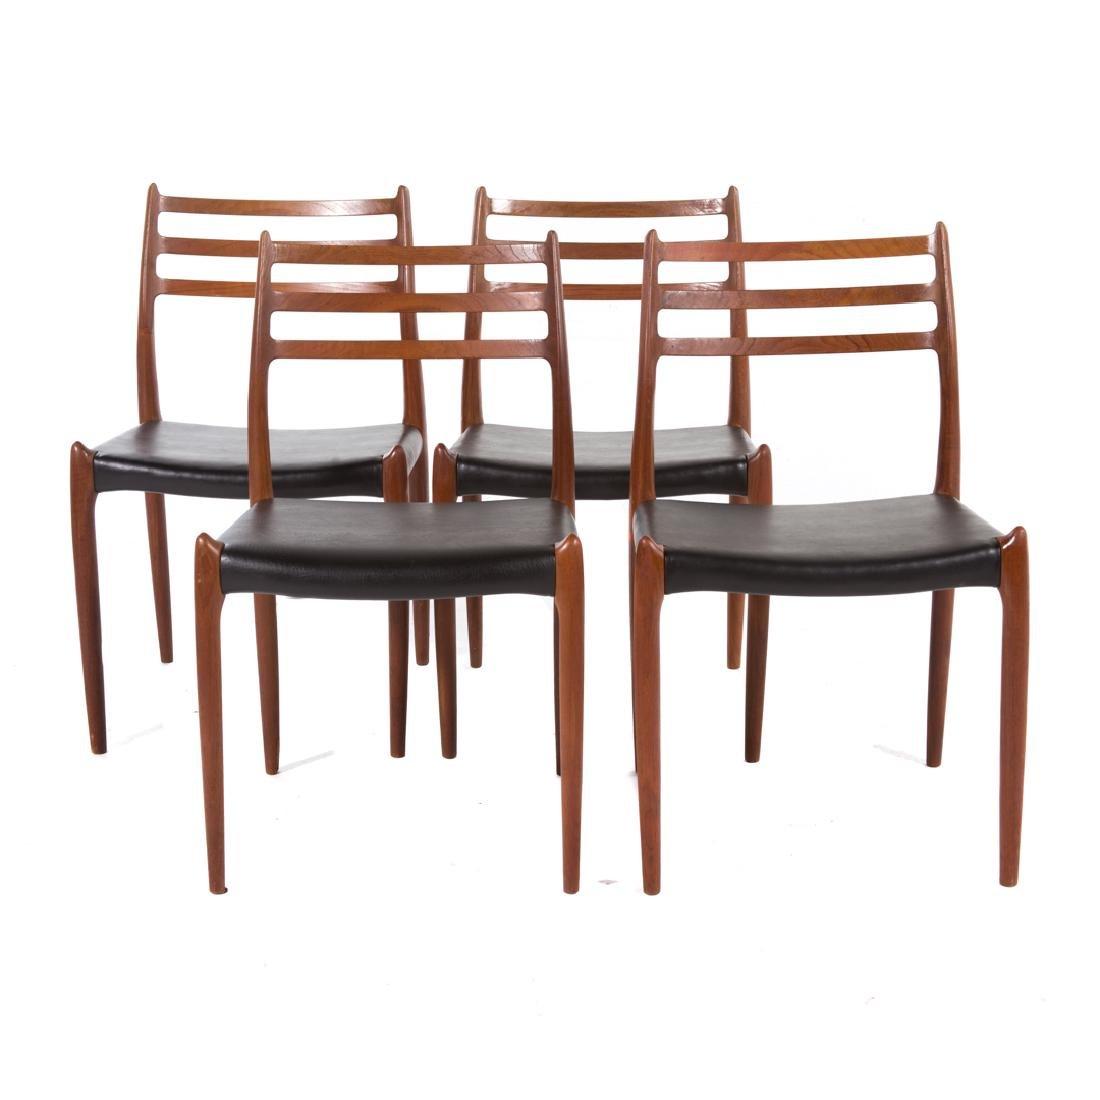 Four Danish Modern teakwood dining chairs